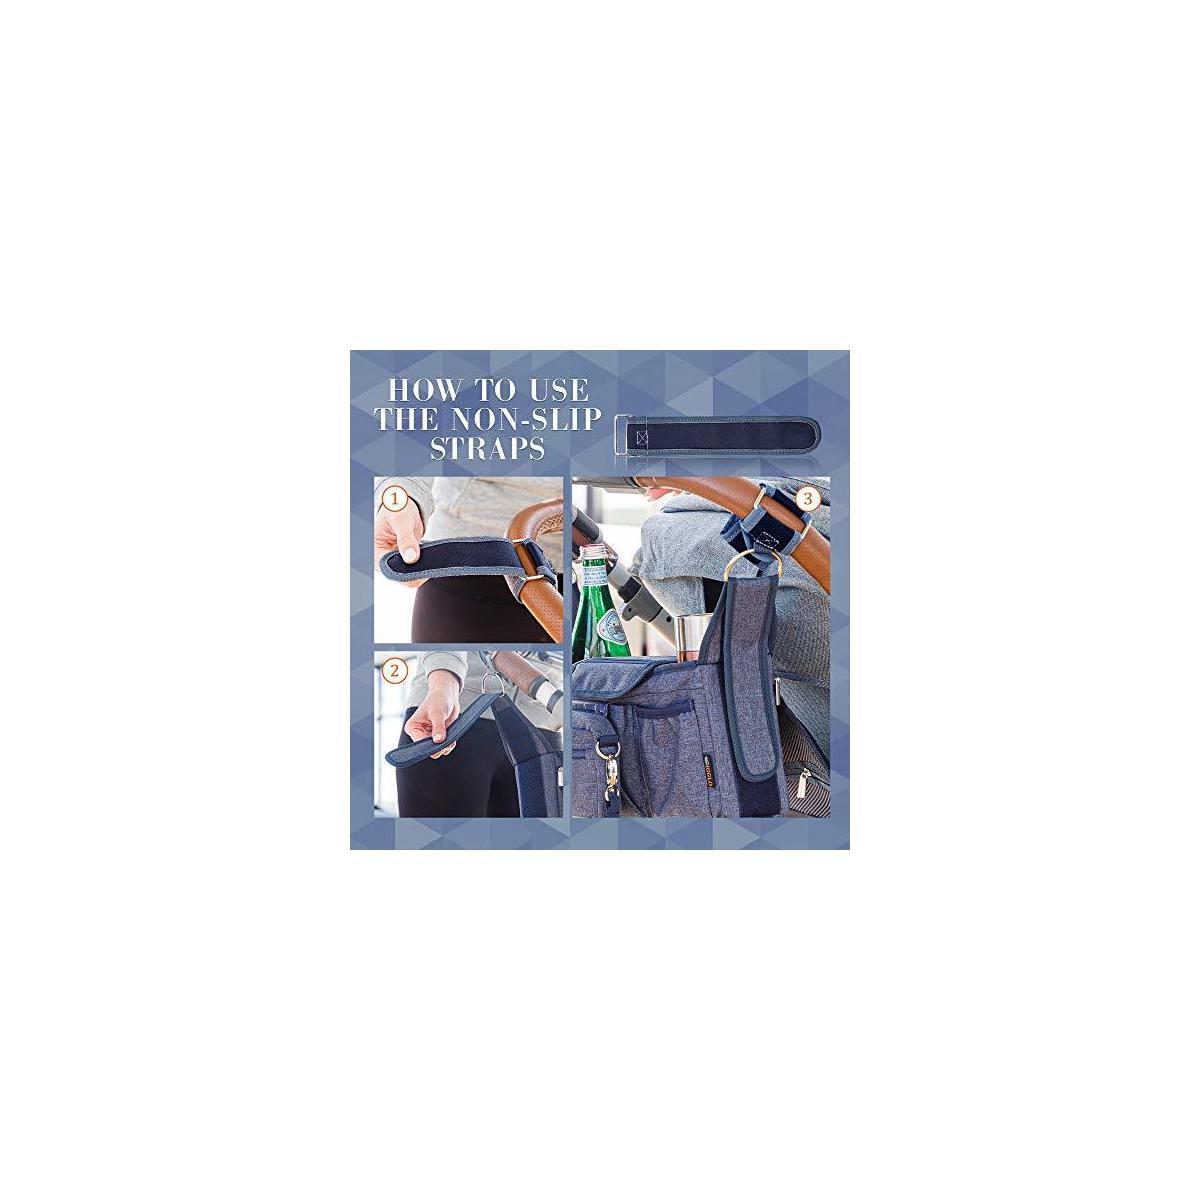 IGGLO Universal Non-slip Stroller Organizer   Insulated Cup Holders   BONUS Stroller Cup Holder And 2 Stroller Hooks   Baby Stroller Accessories Bundle For Moms   Universal Fit   Best Baby Shower Gift